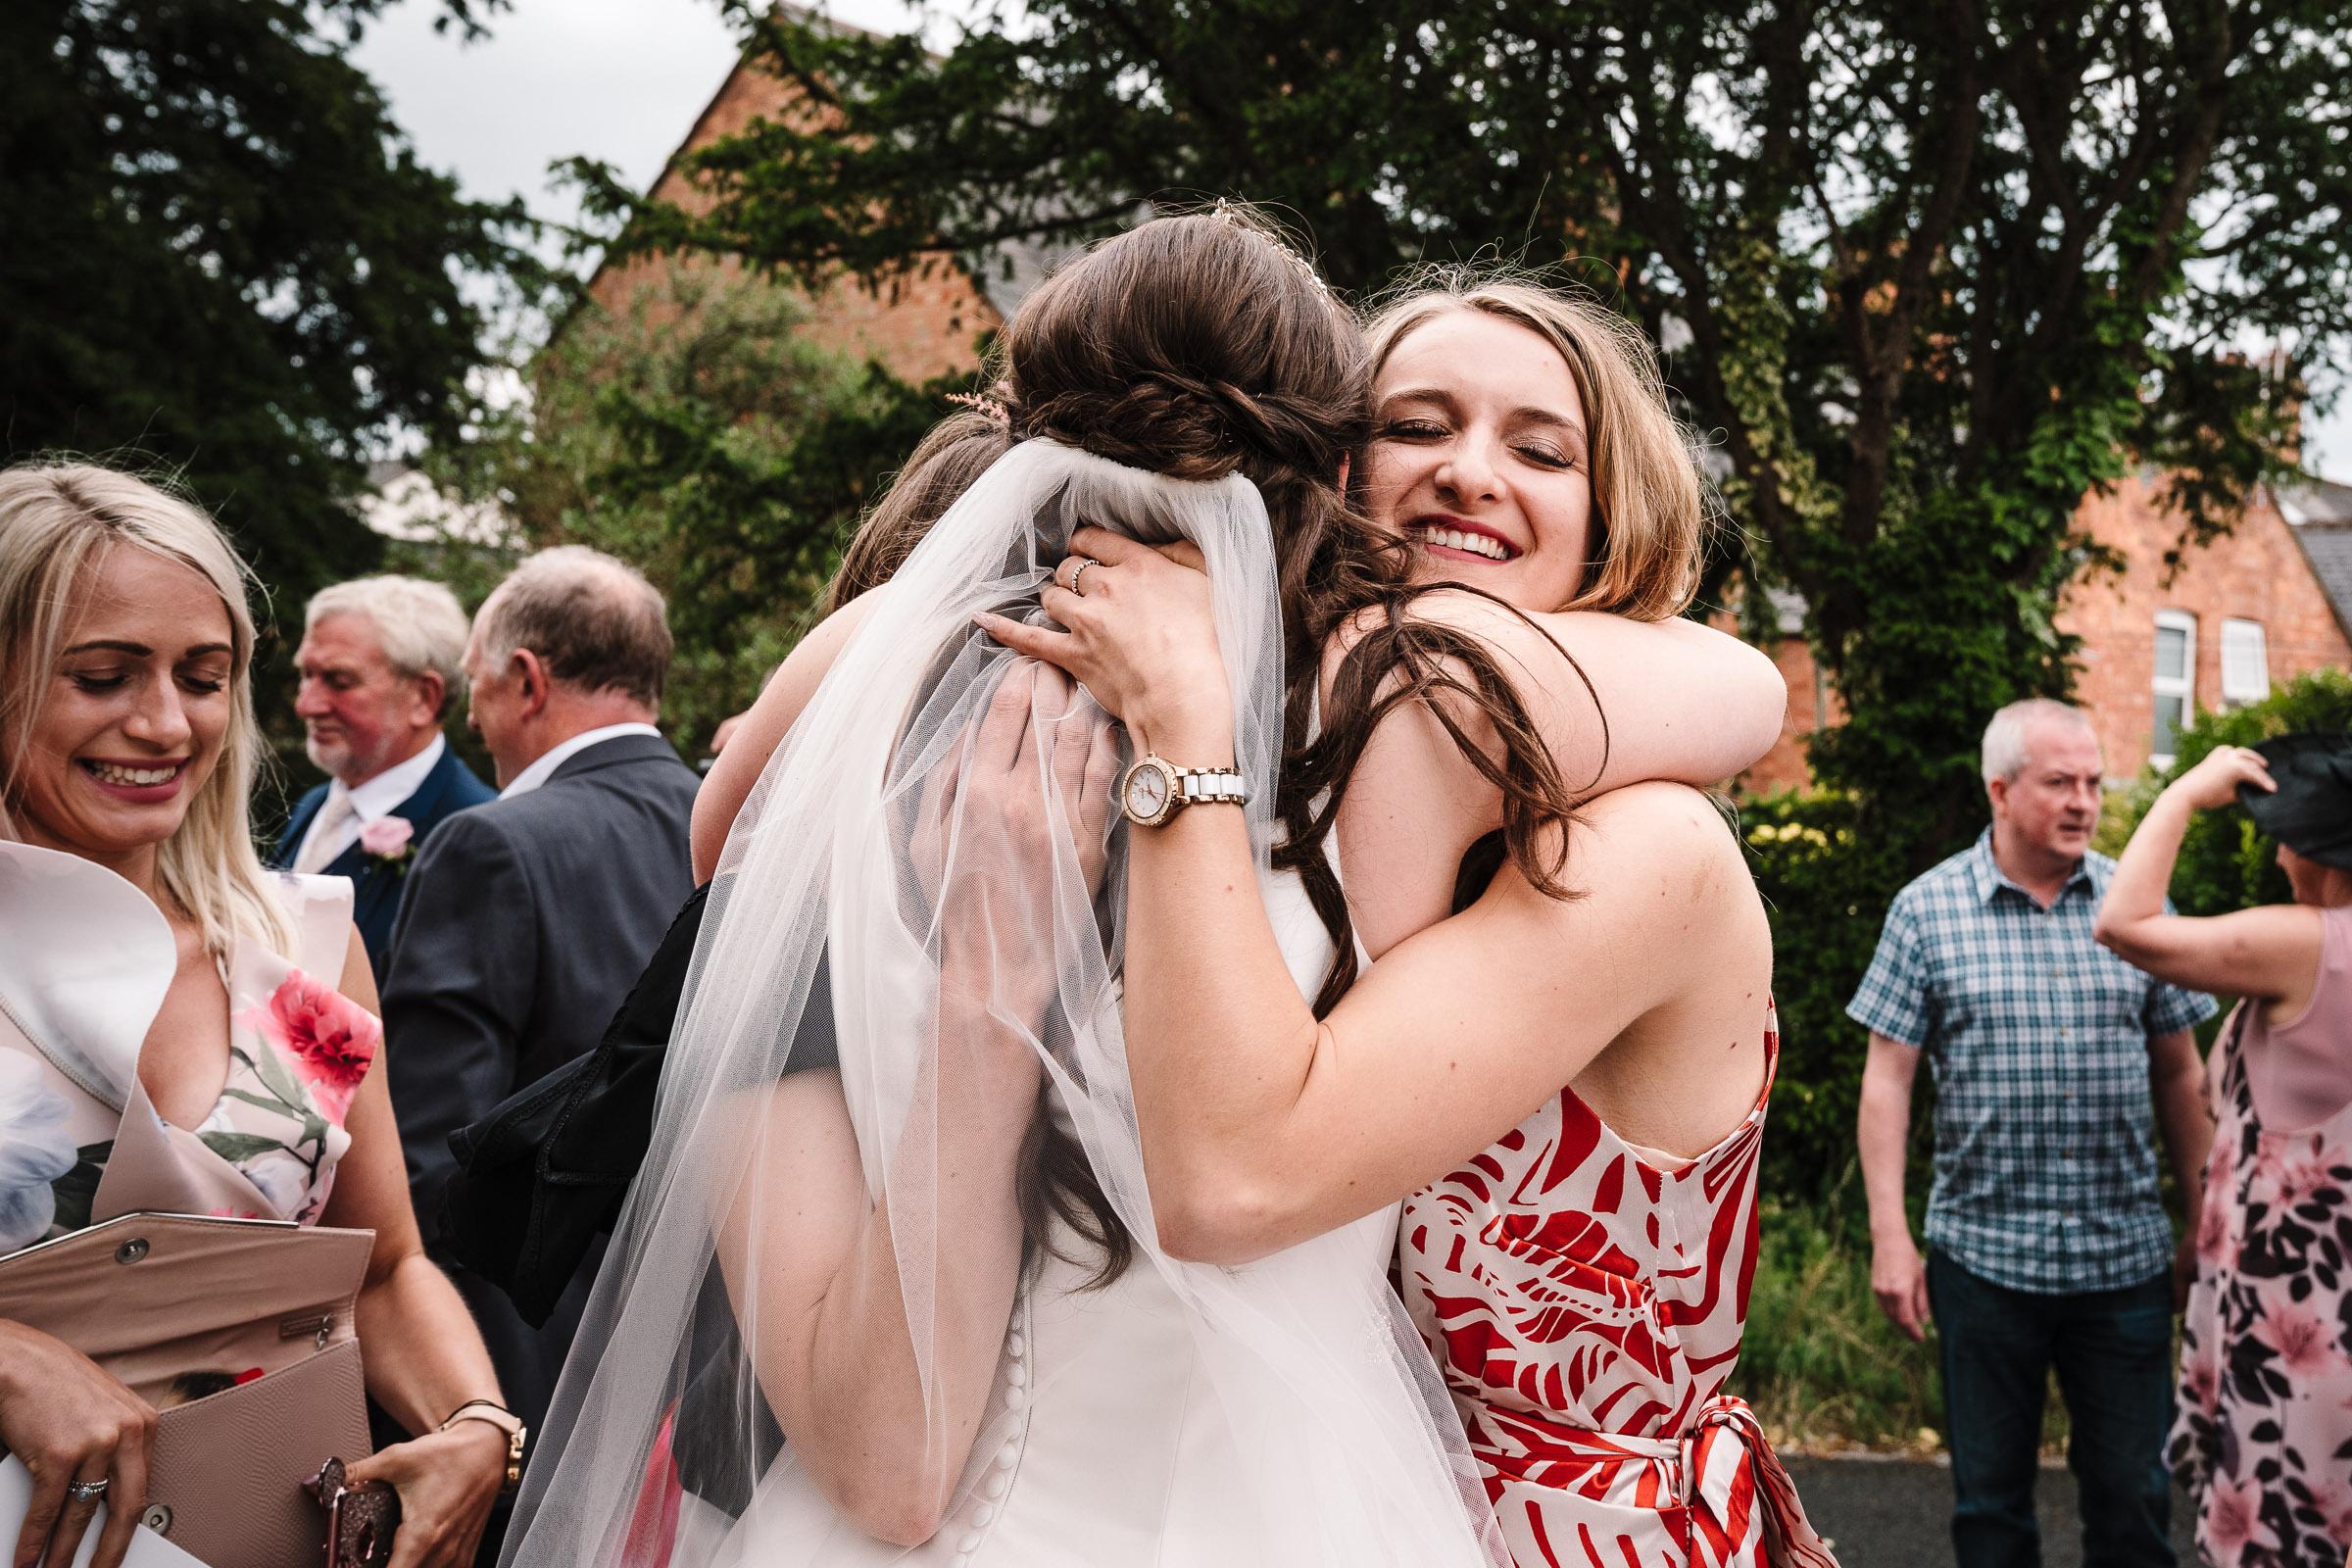 guests hugging bride after wedding ceremony